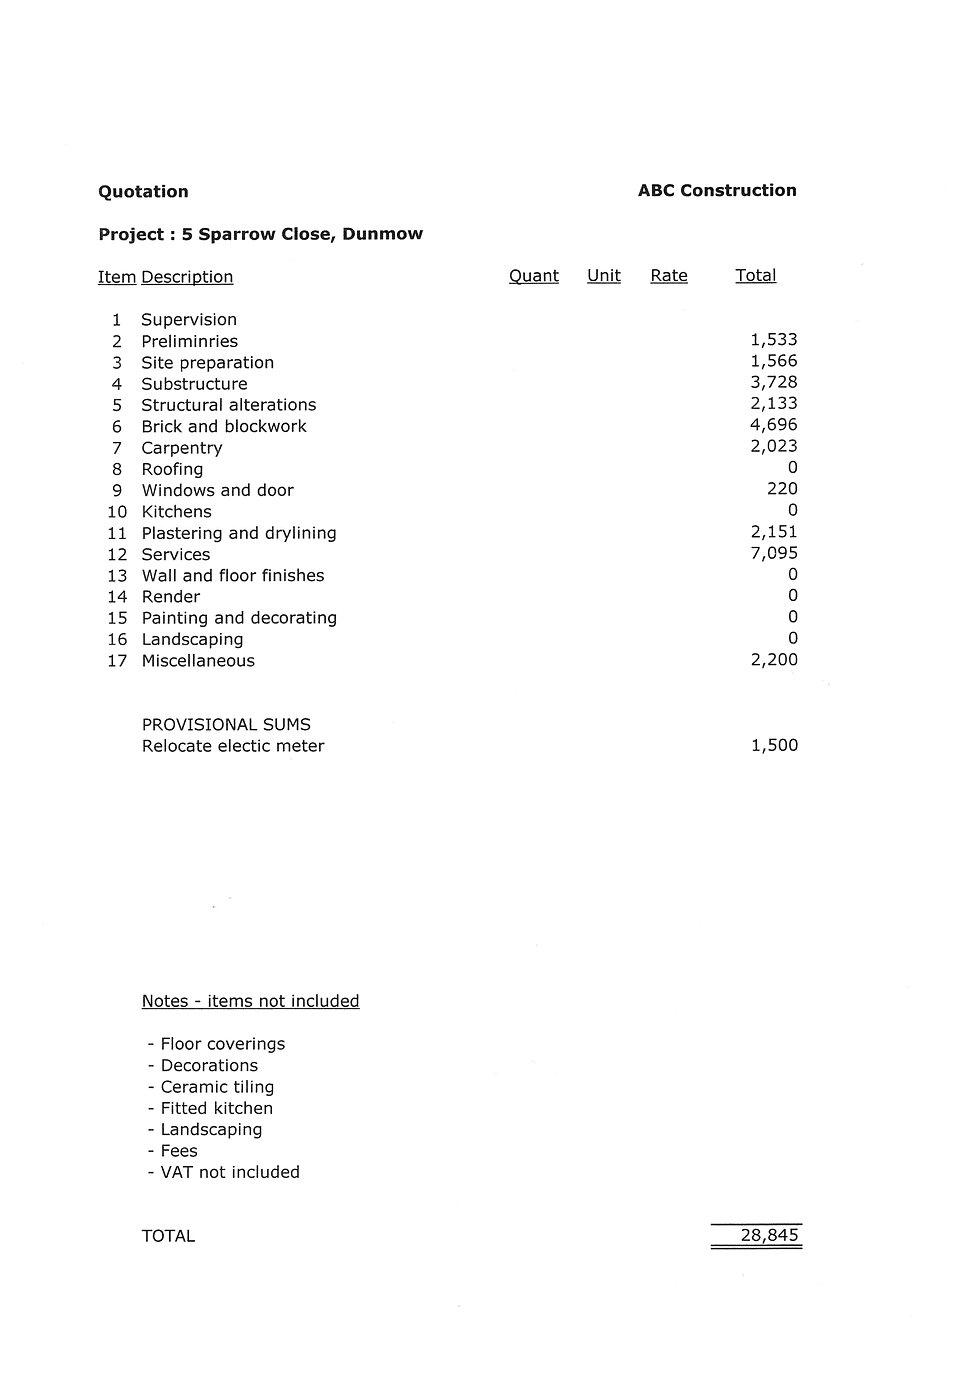 khg property quote sample summary